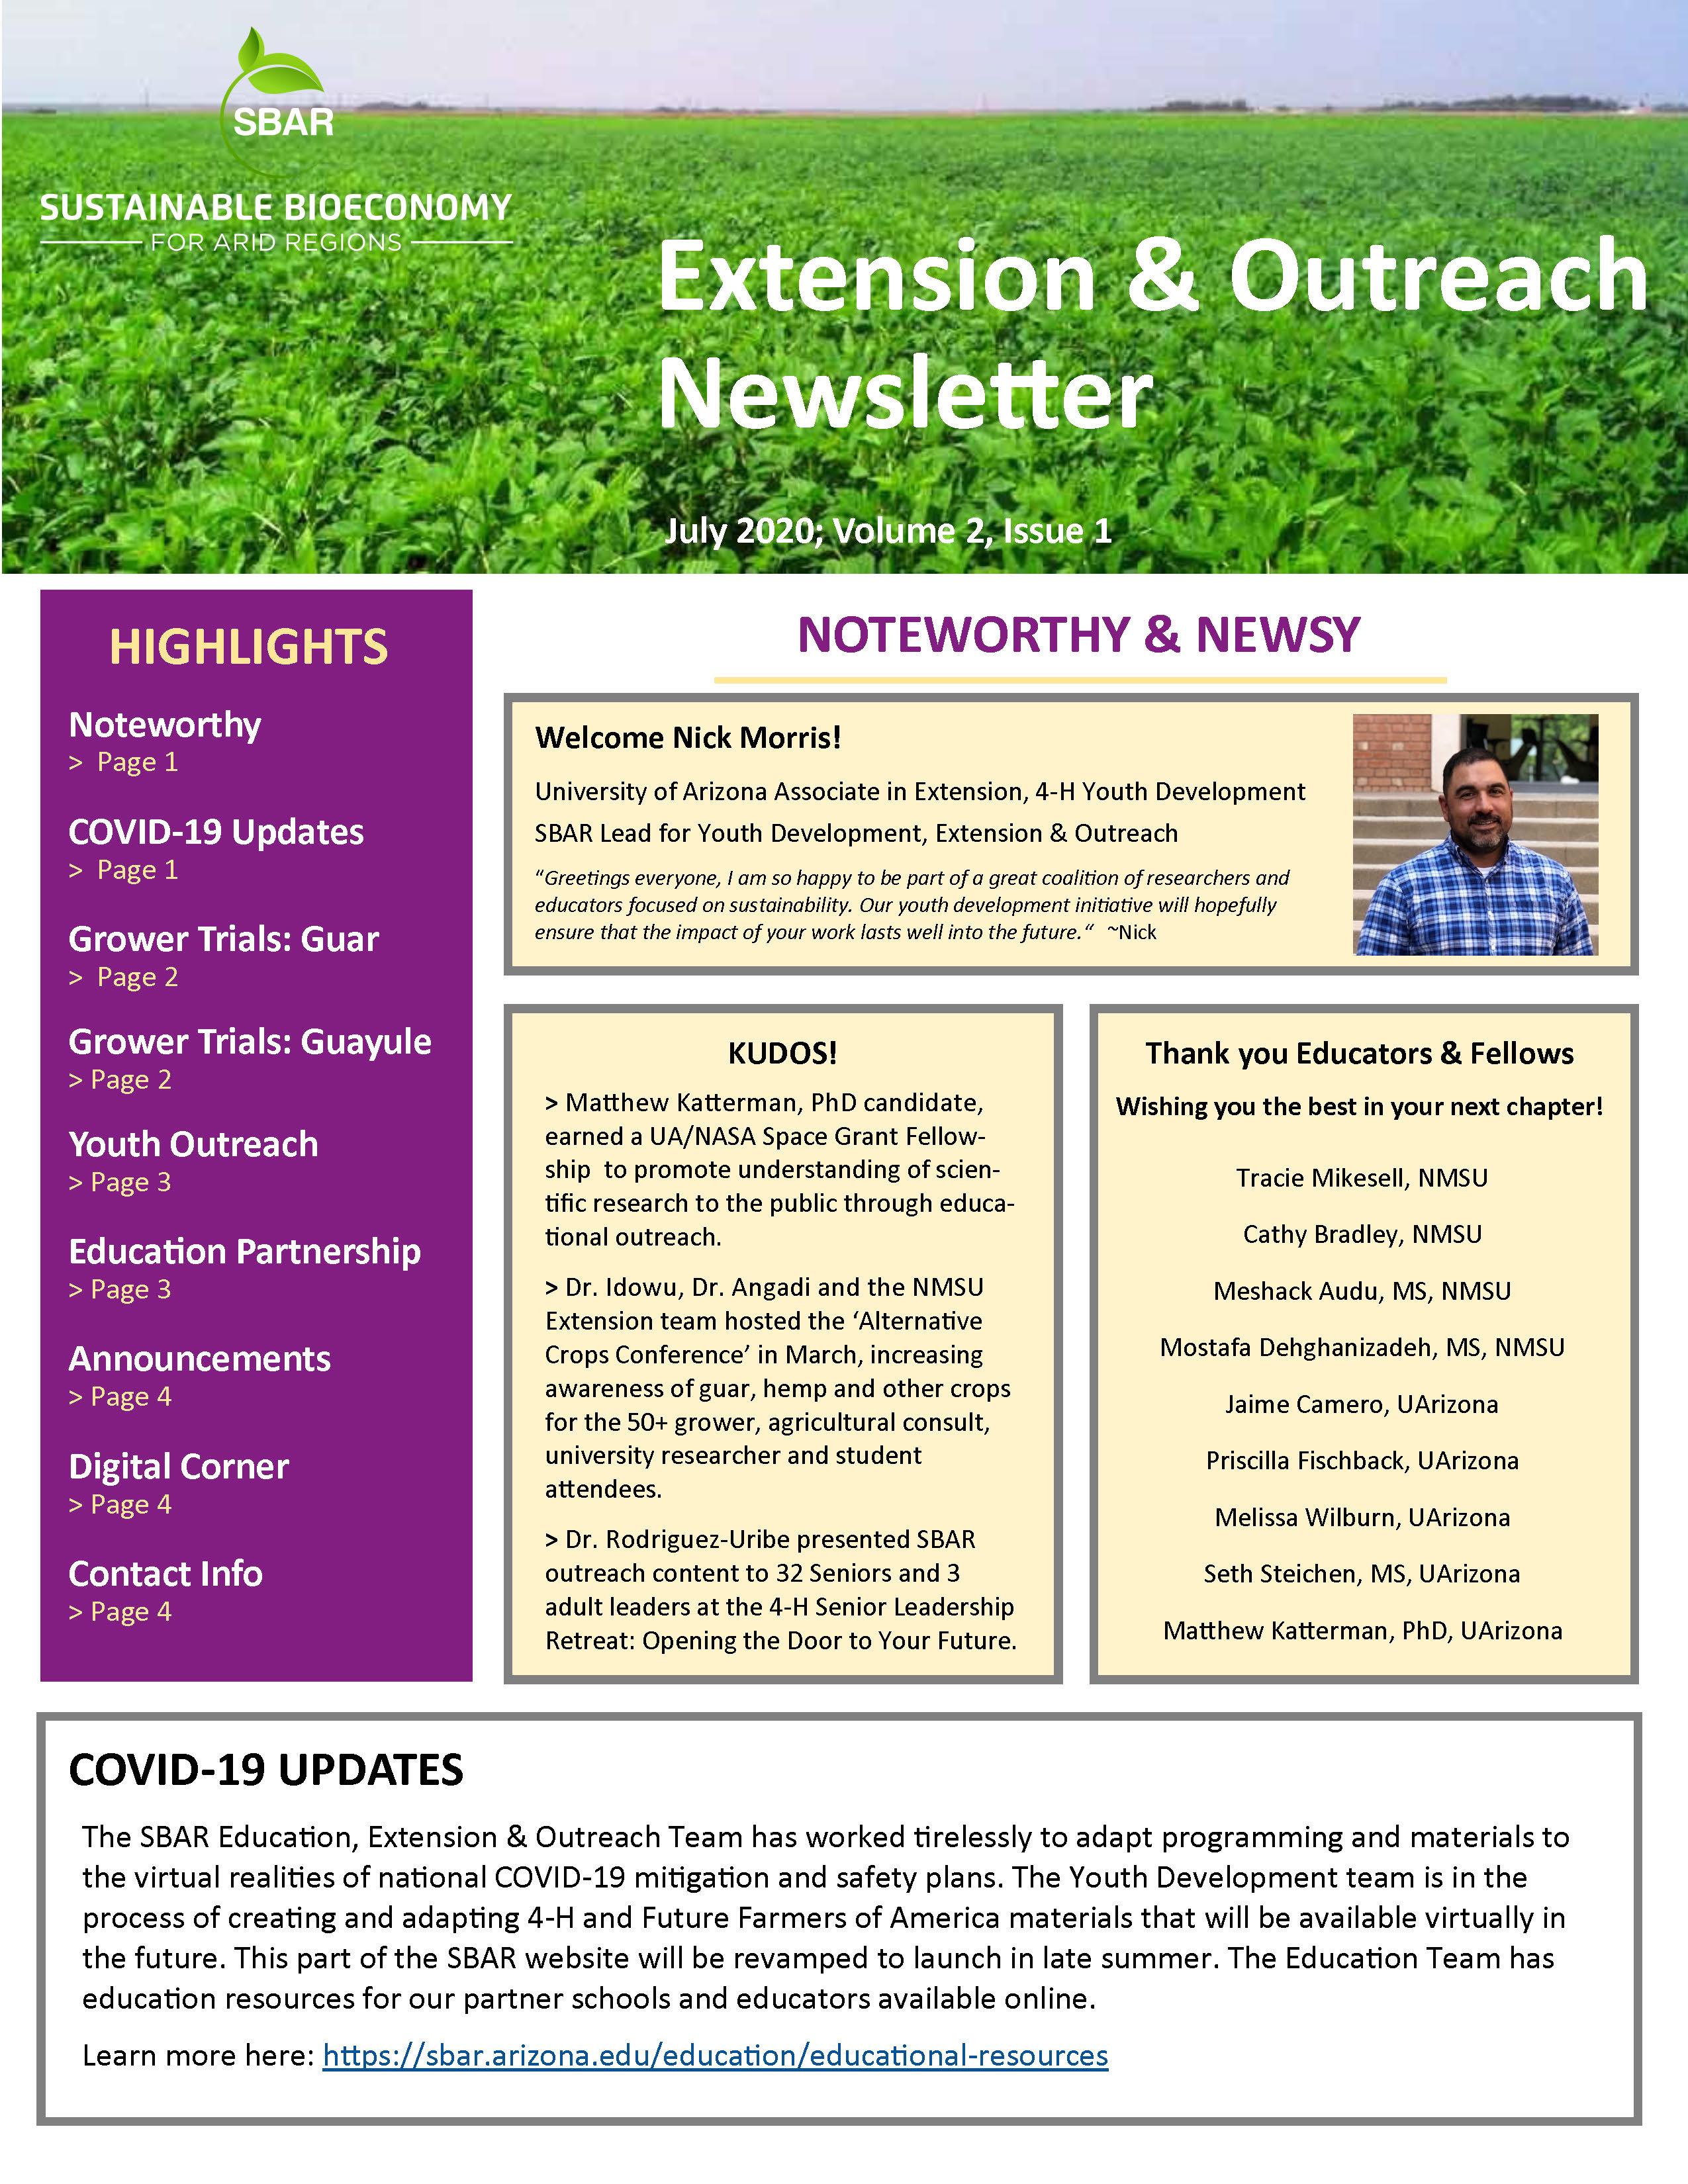 SBAR Extension-Outreach Newsletter 2020 vol 1